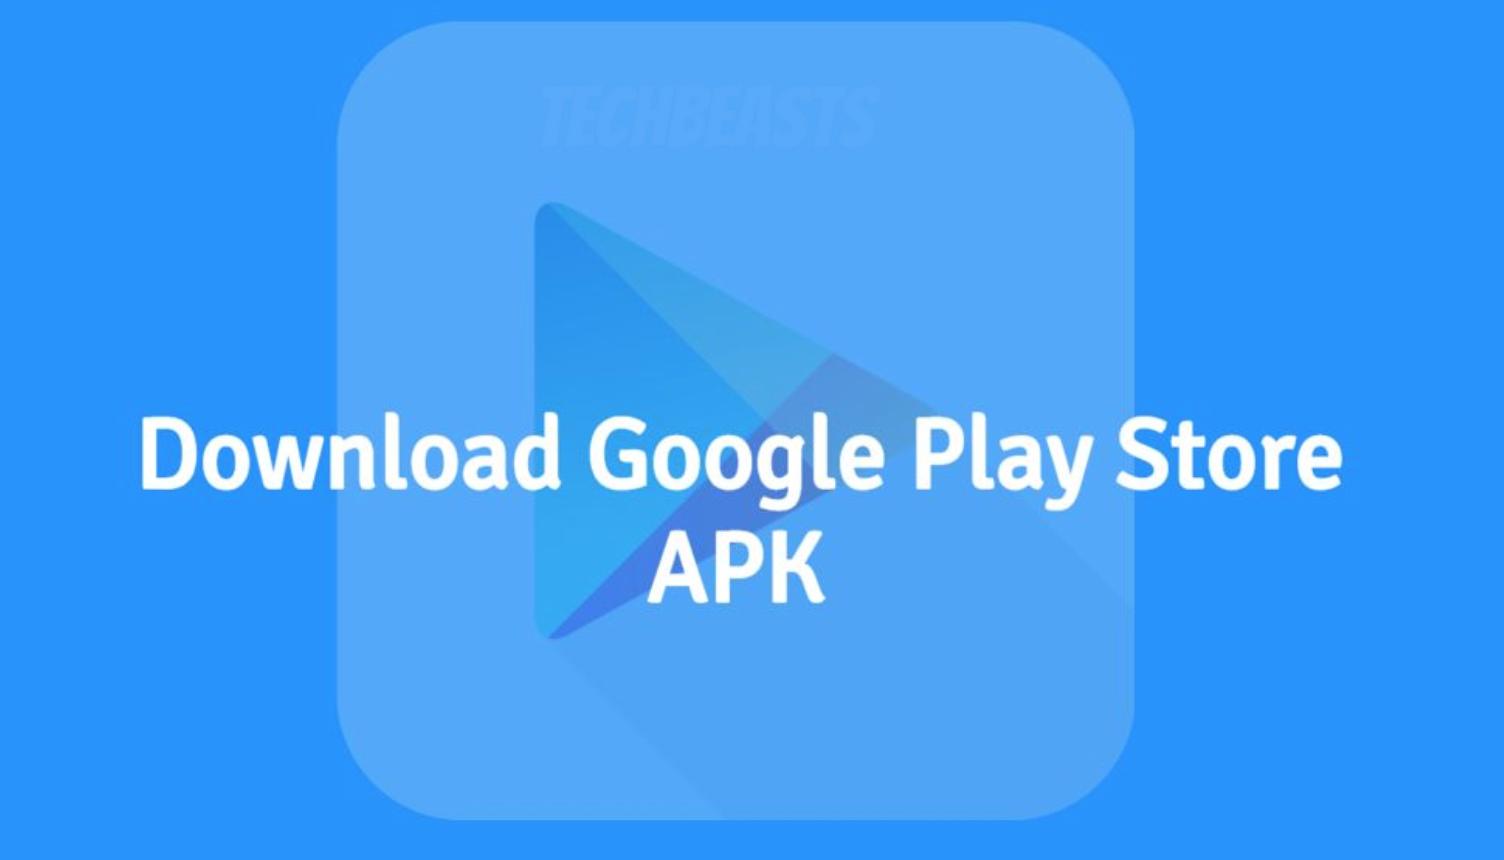 Google Play Store APK